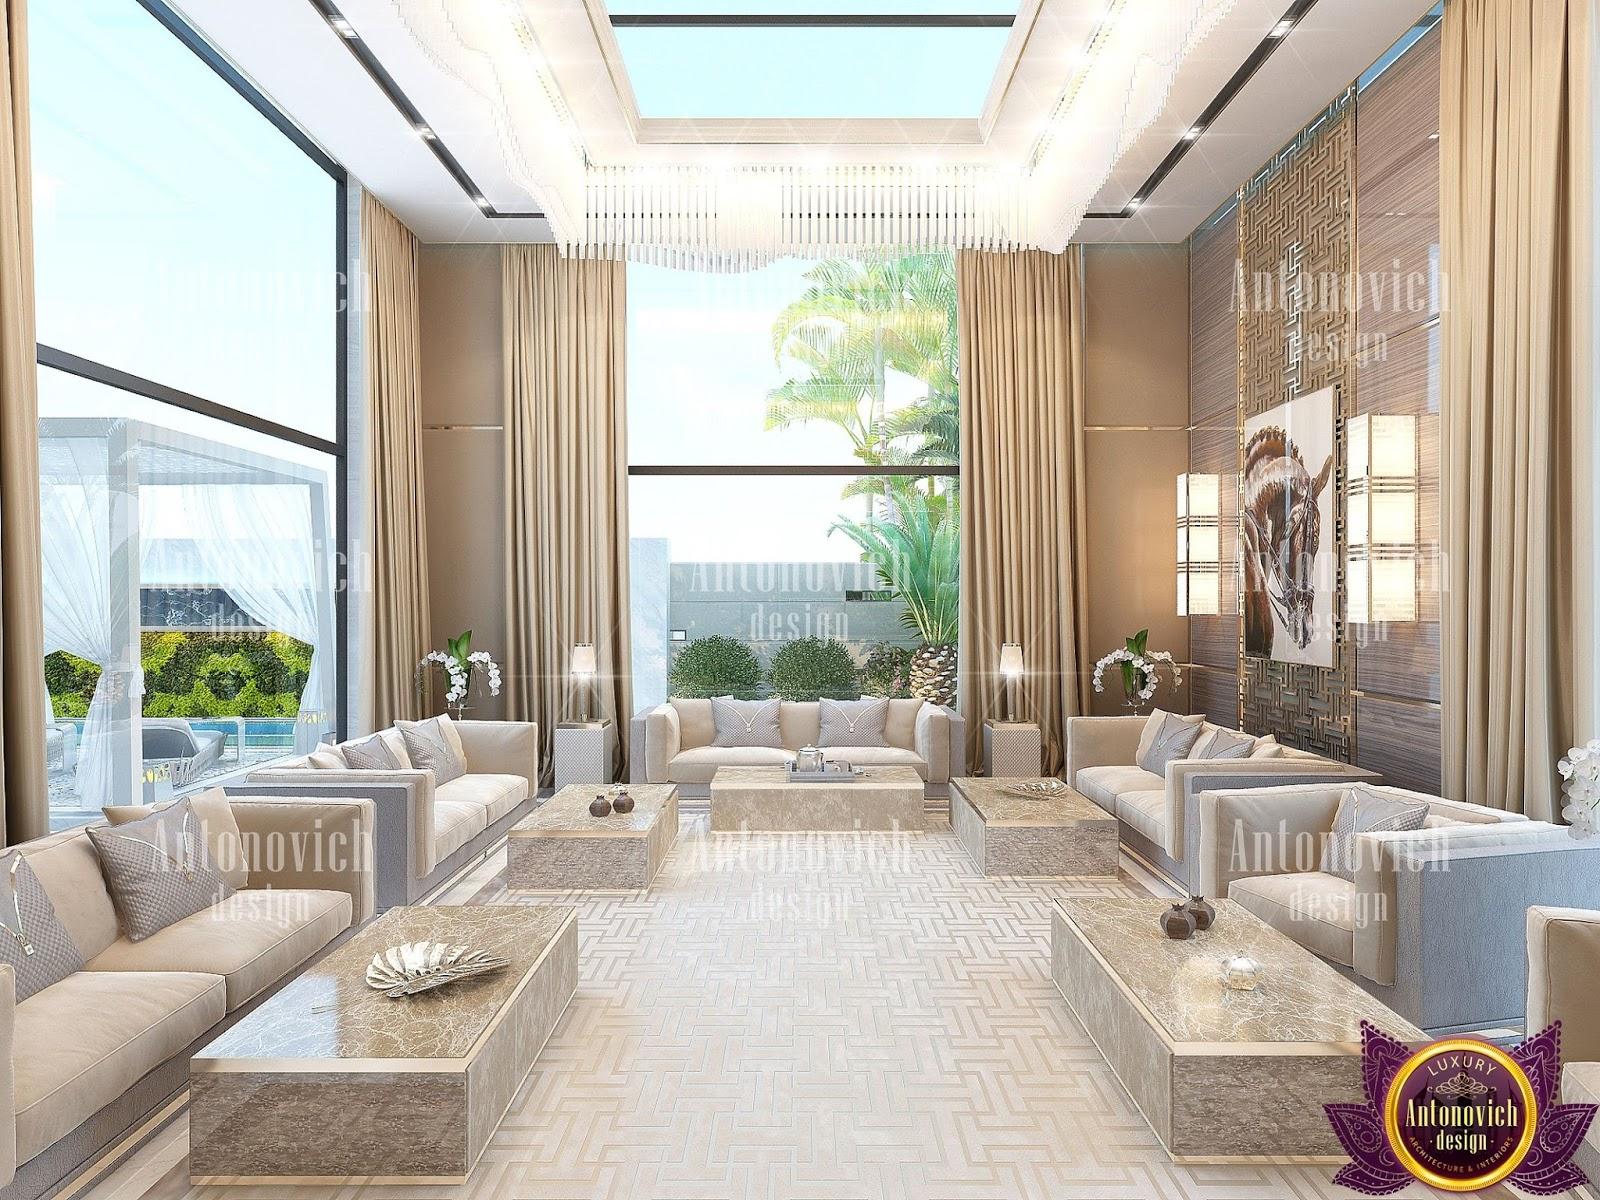 Modern Contemporary Interior Design, Katrina Antonovich